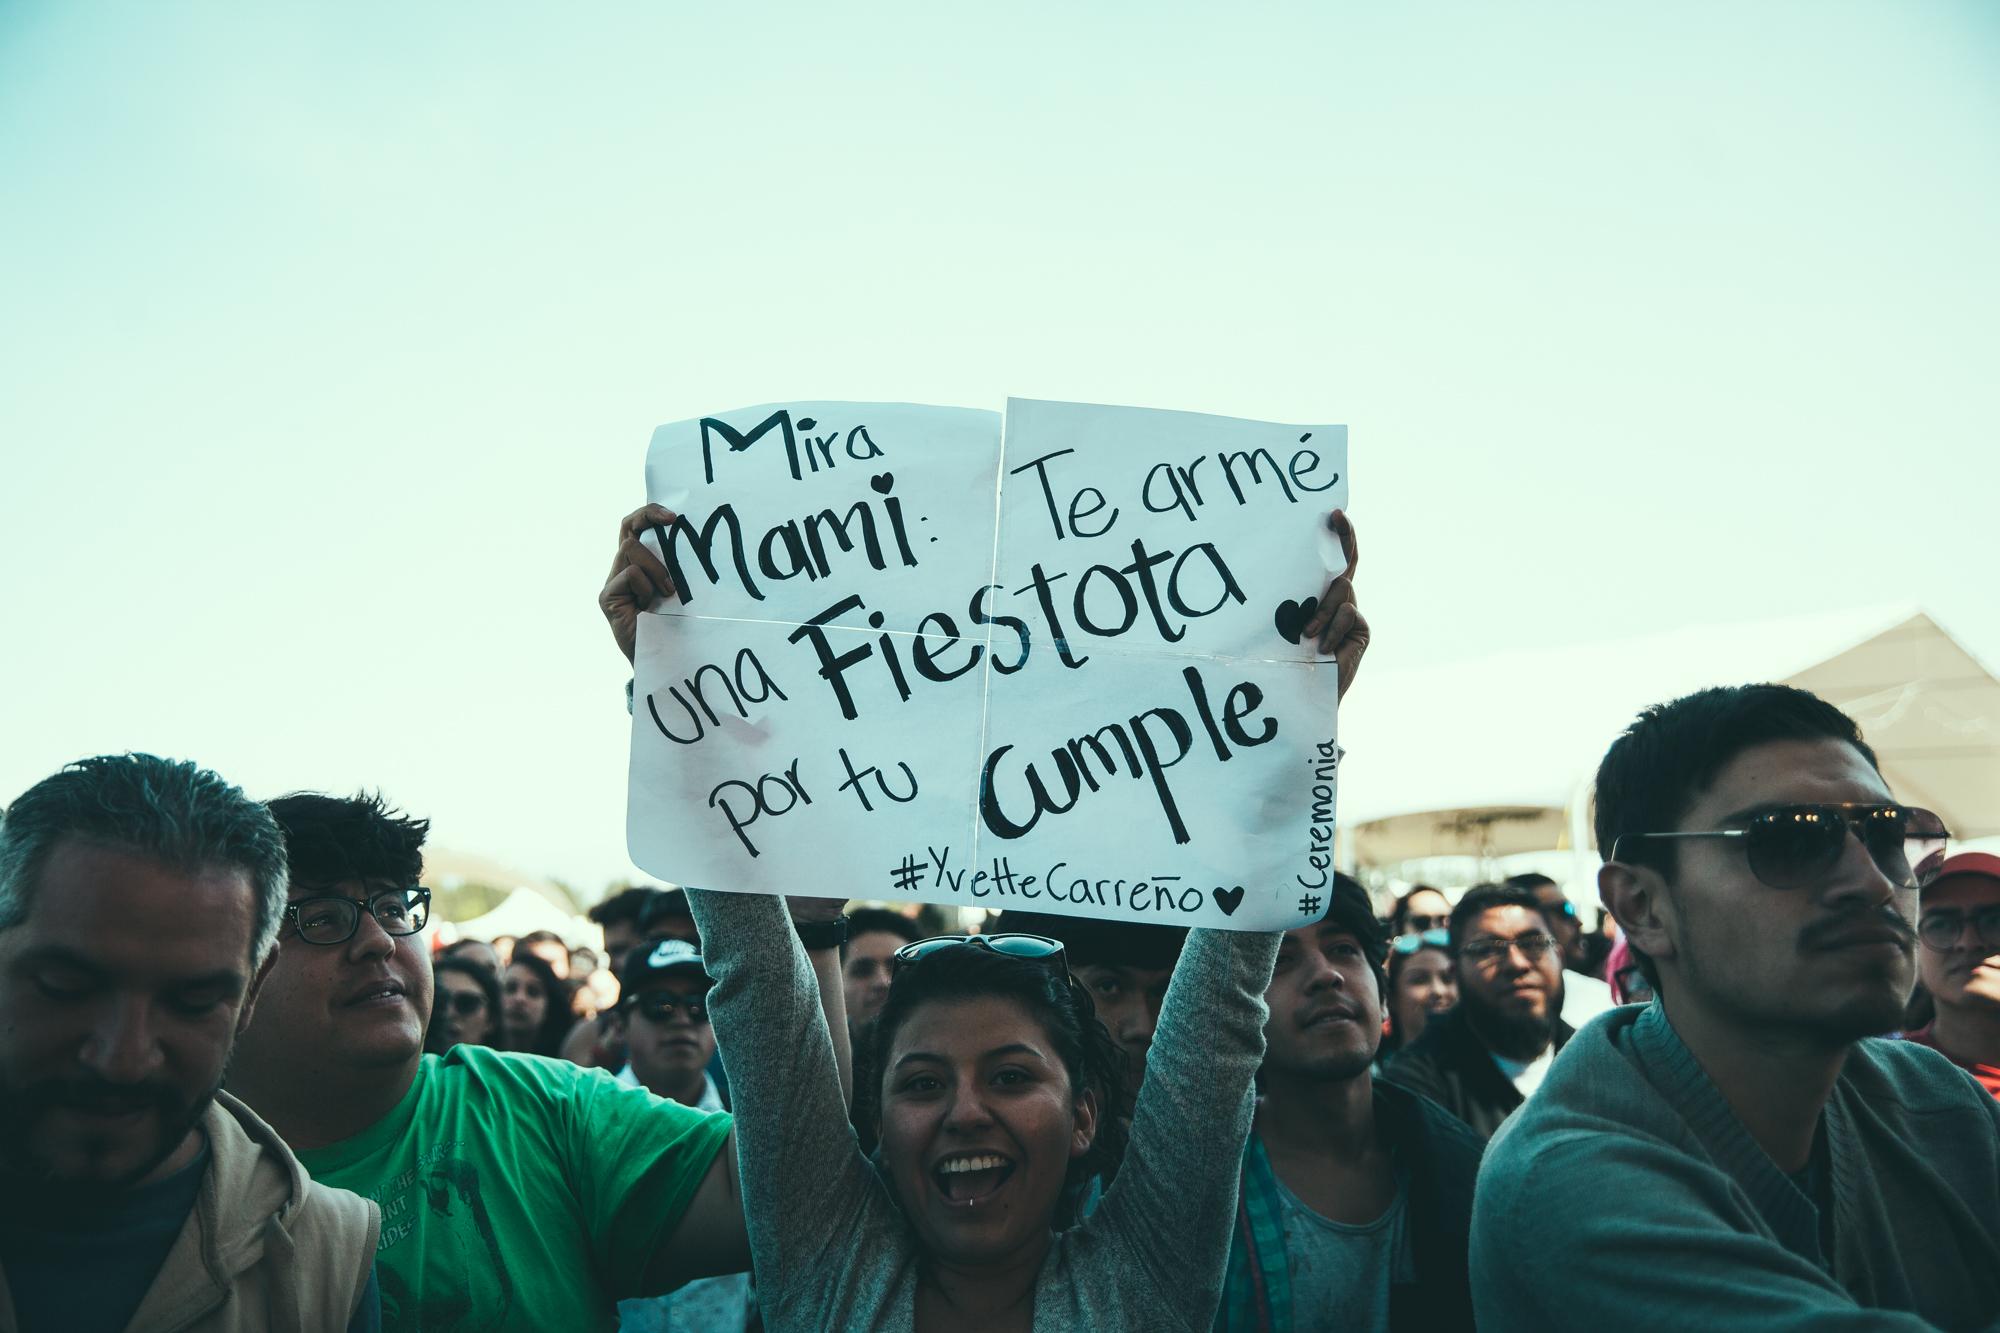 Crowd-Festival Ceremonia-Mexico-Foro Pegaso-04.02.2017-Daniel Patlan_Desde 1989 (9 of 49).jpg